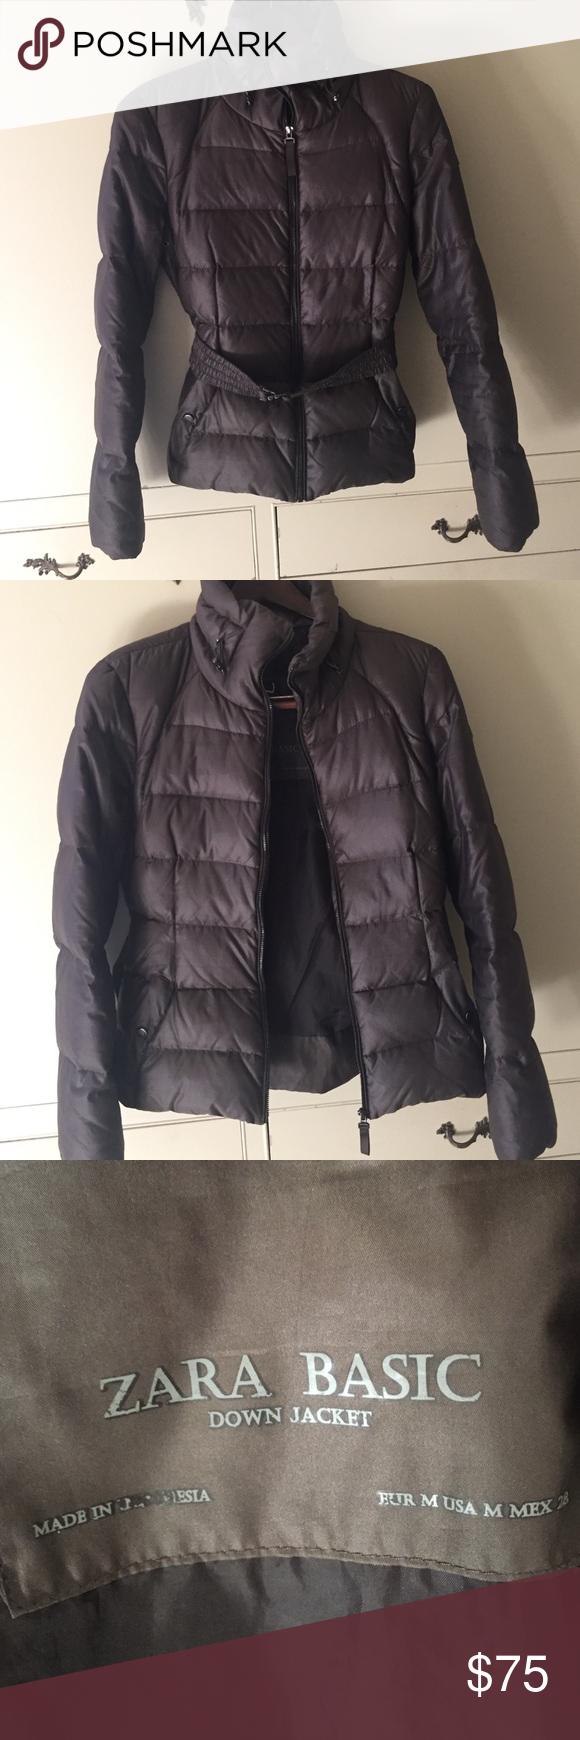 Zara Basic Down Jacket Puffer Coat With Belt Jackets Zara Basic Zara [ 1740 x 580 Pixel ]